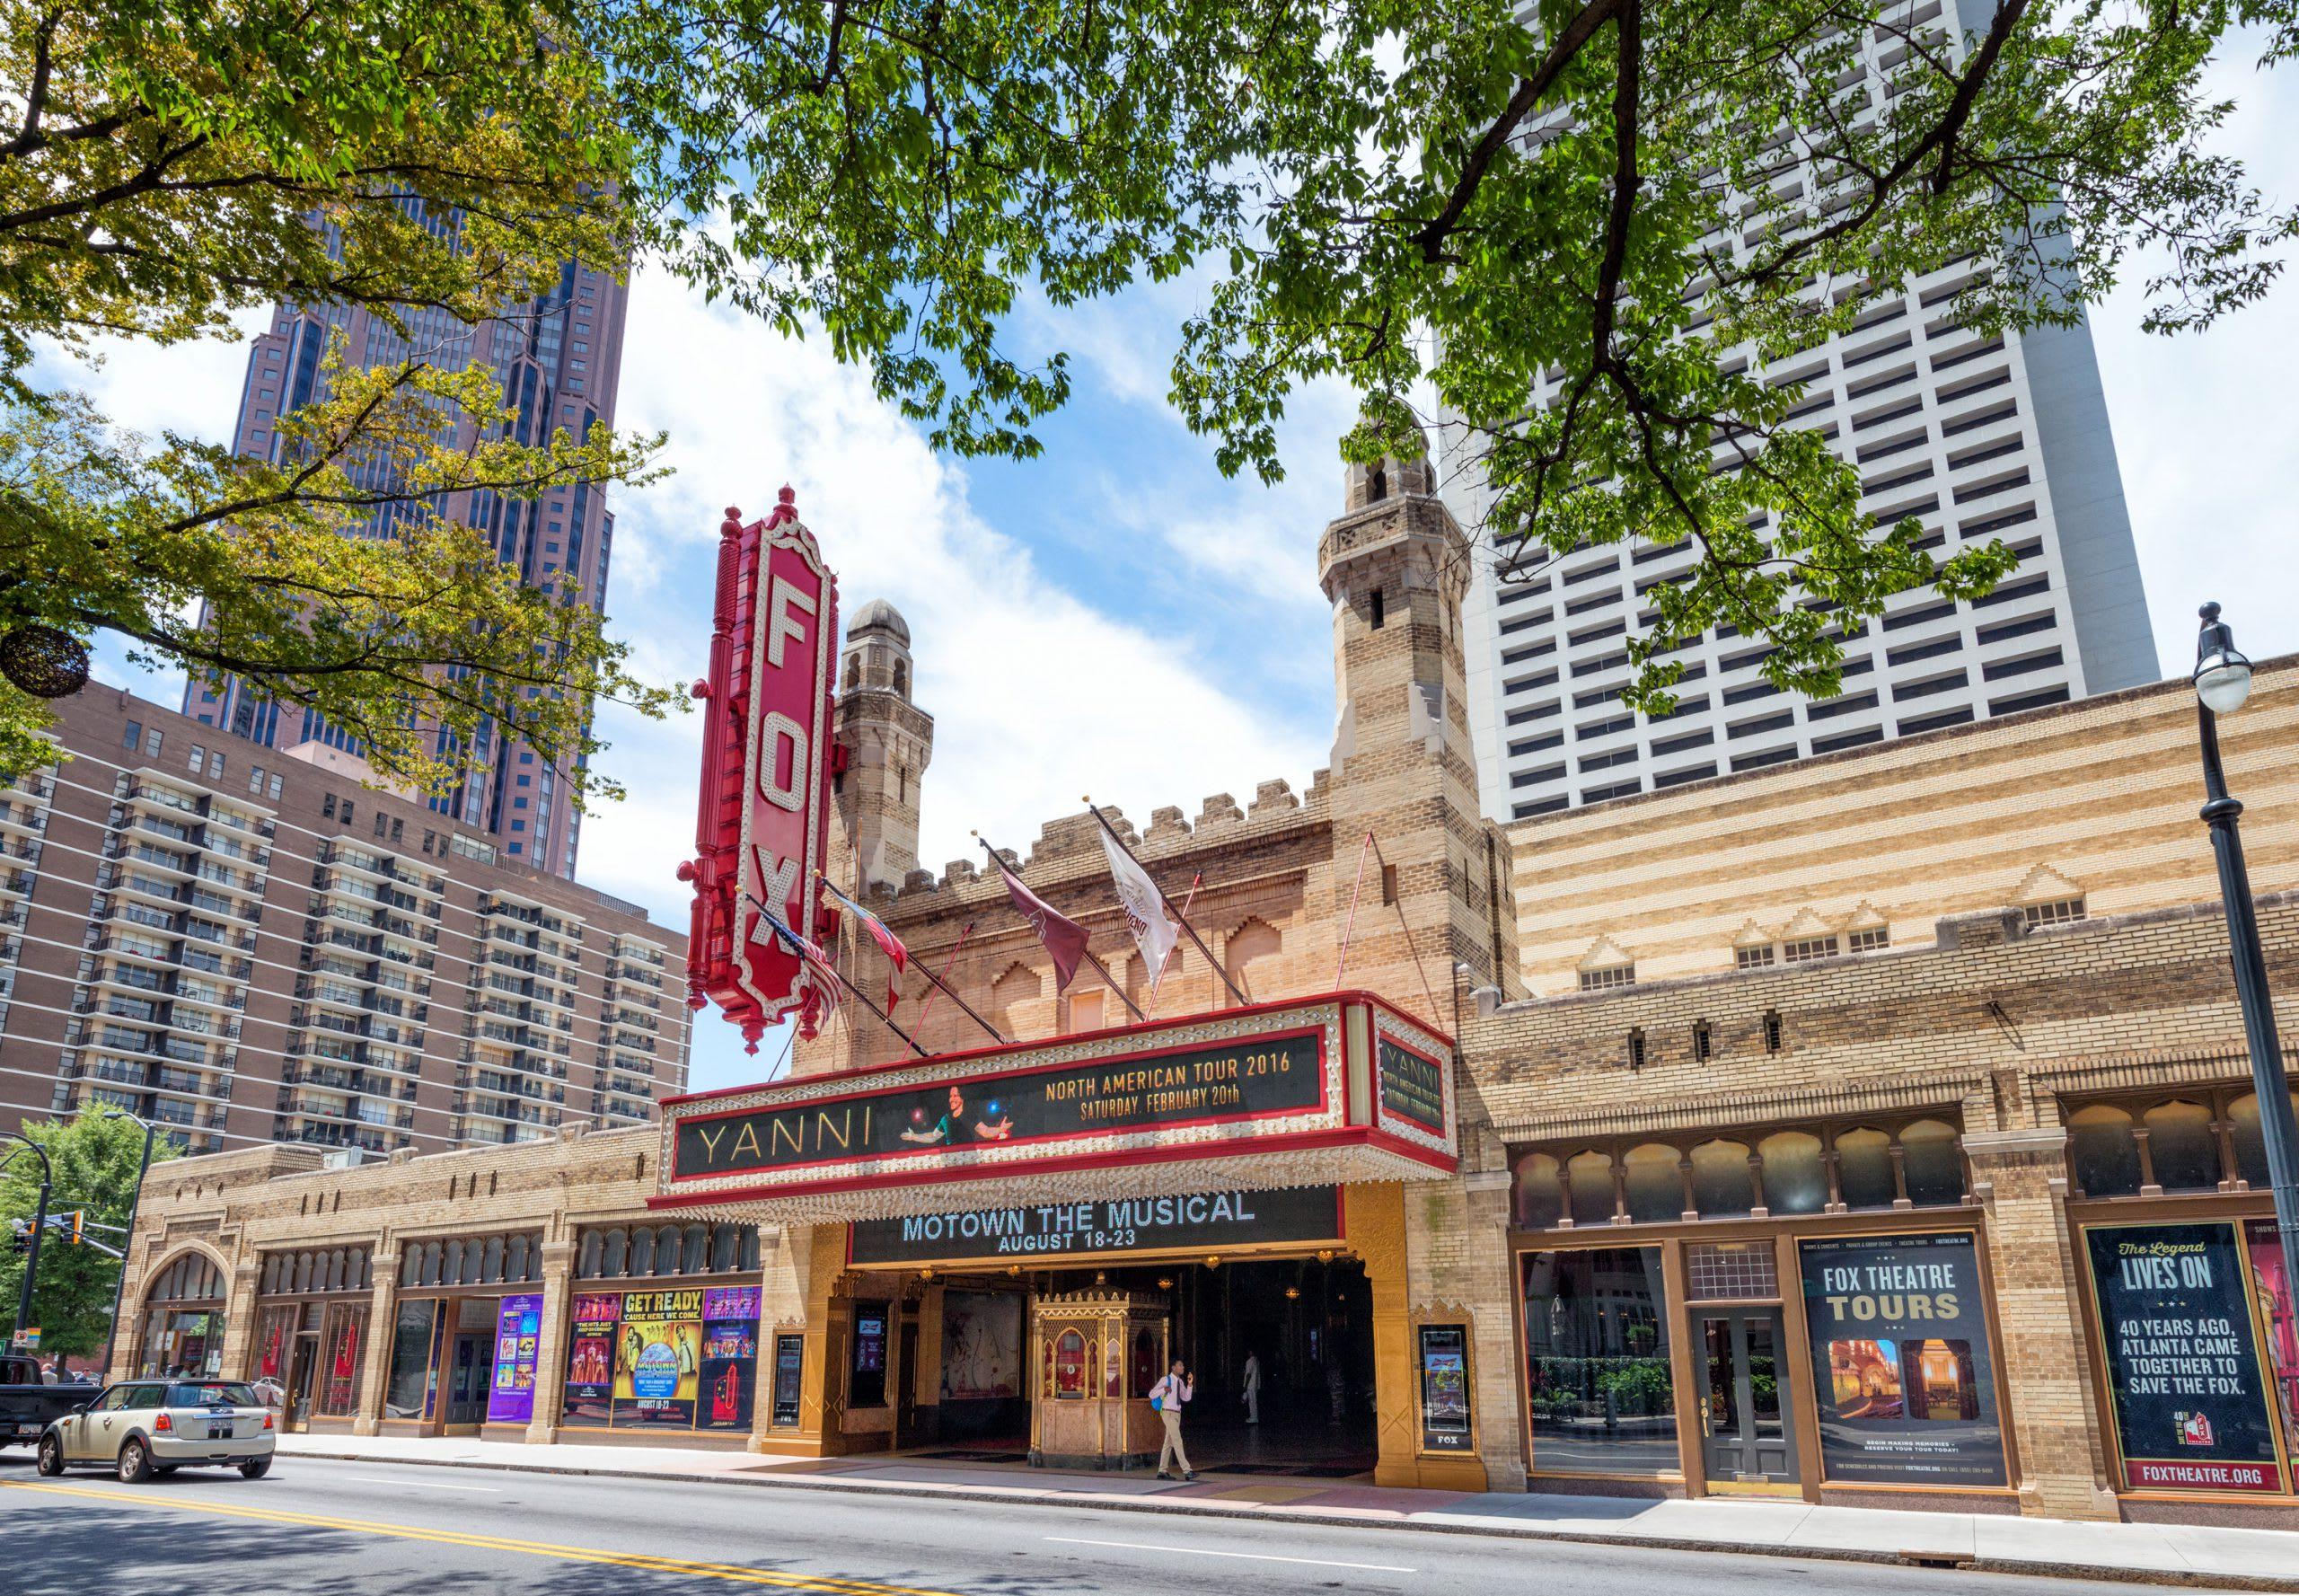 The Fox Theatre exterior